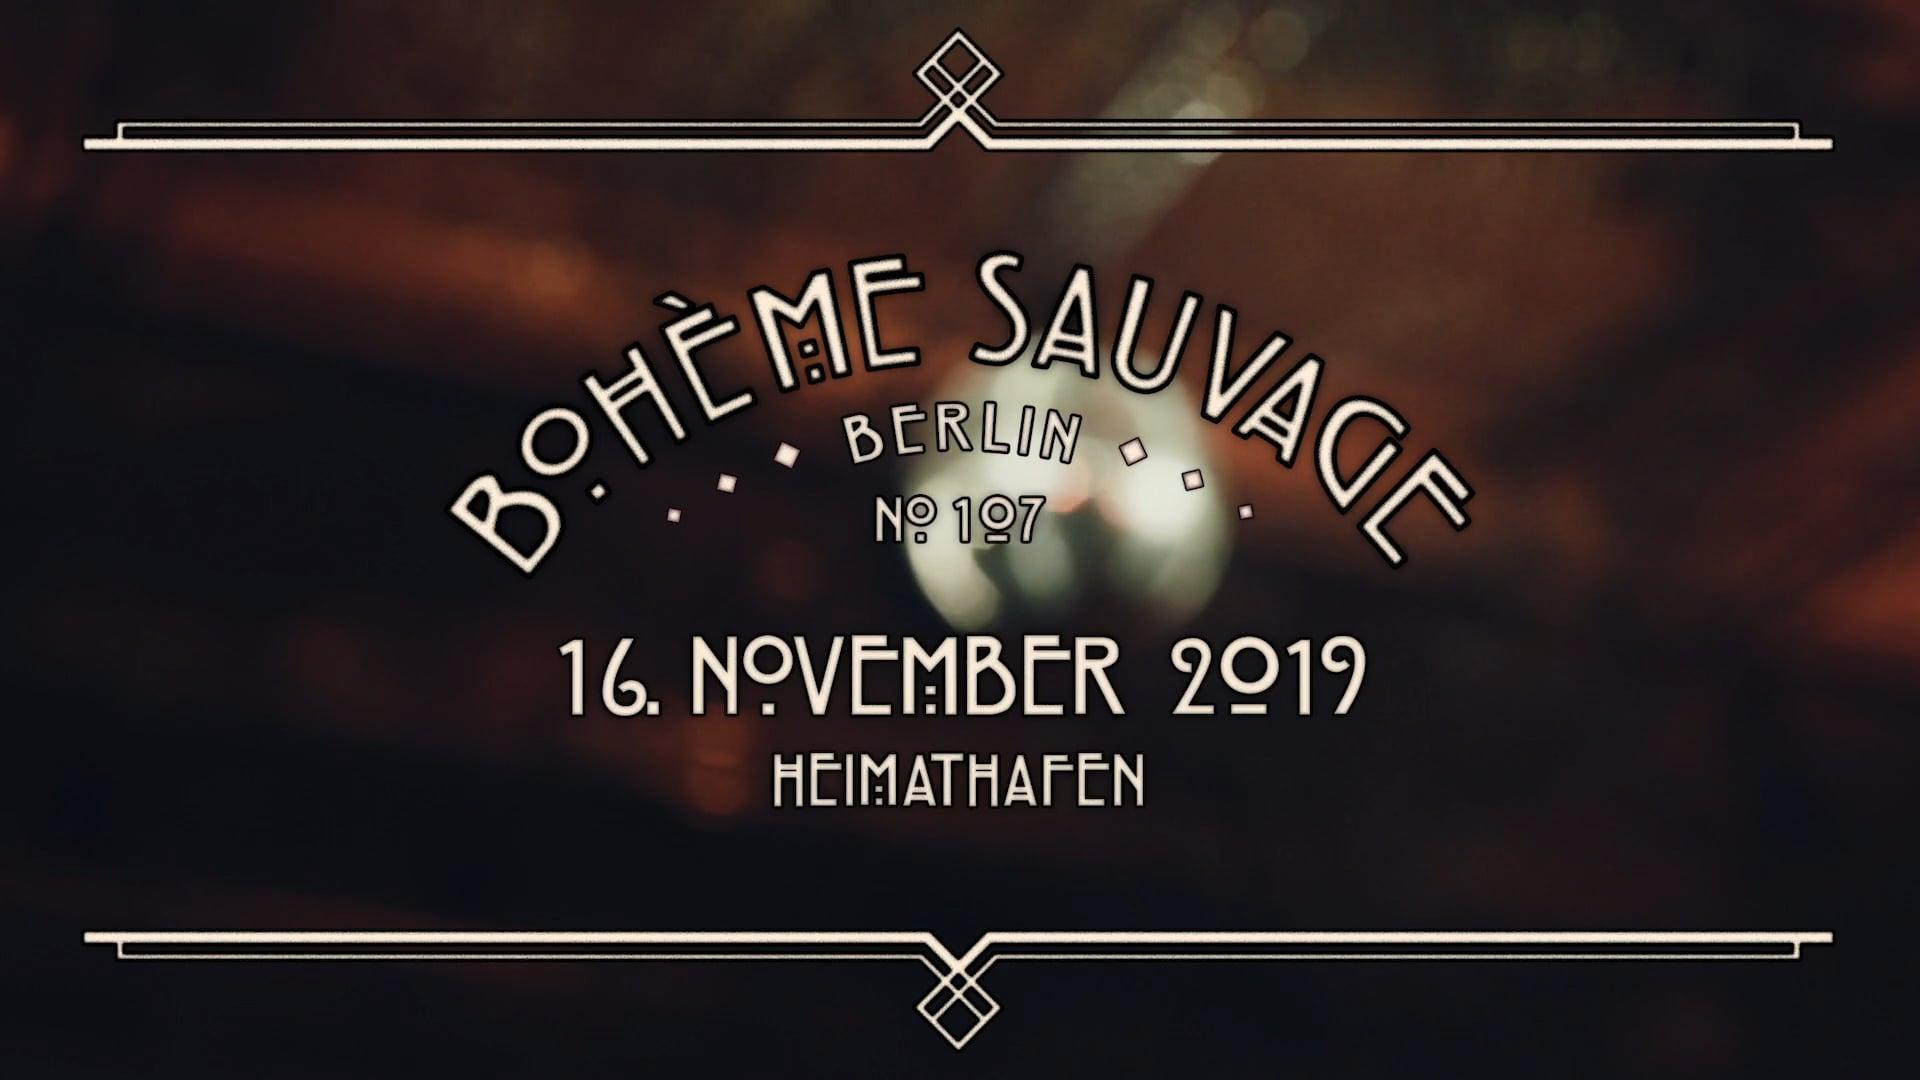 Bohème Sauvage Berlin Nº107 - 16. November 2019 - Heimathafen